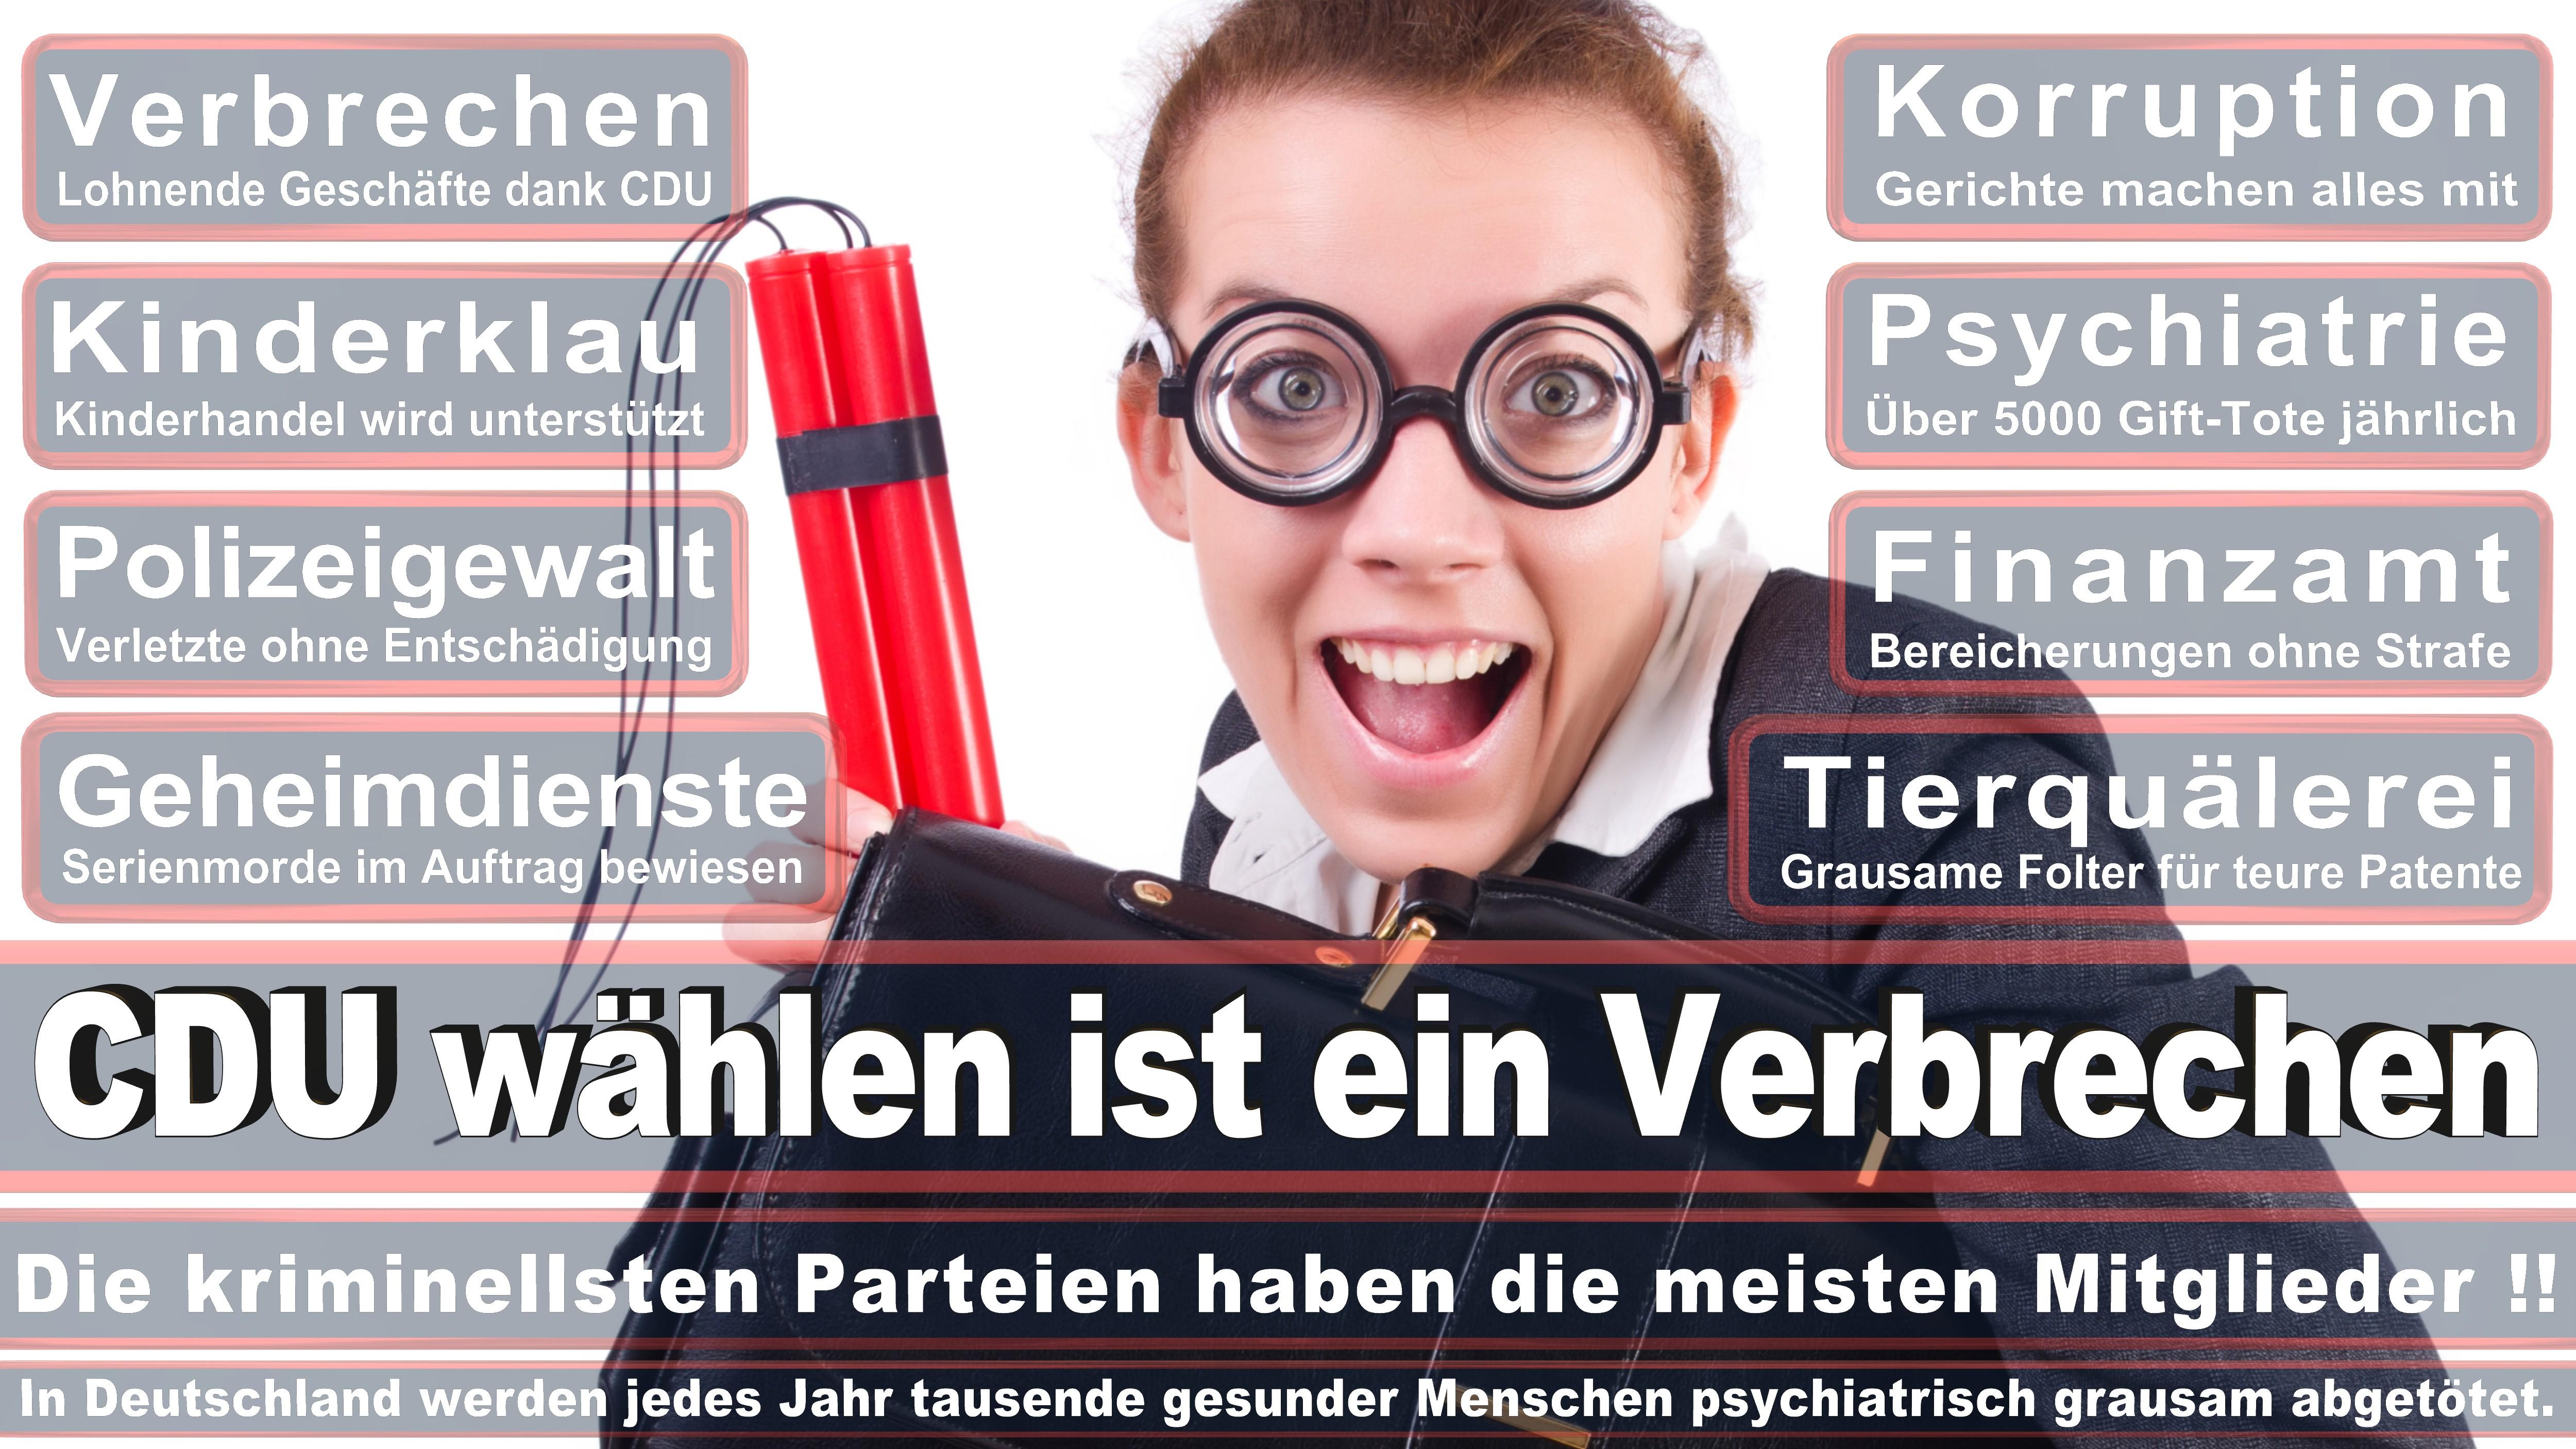 Mark Helfrich CDU CSU Politiker